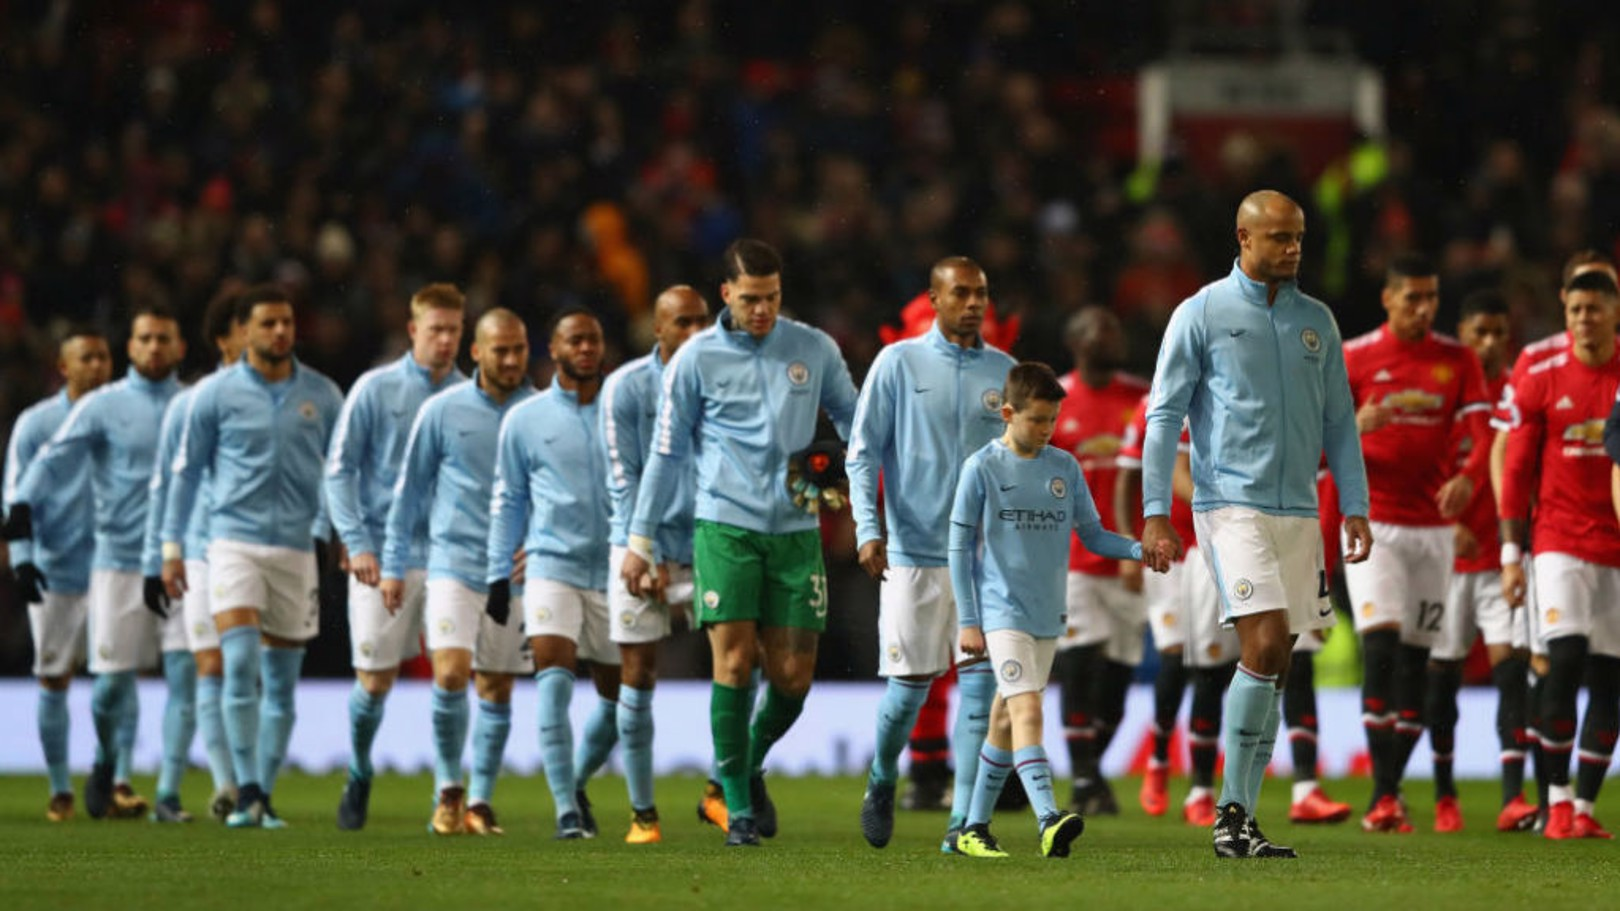 Manchester United v City: Ticket info